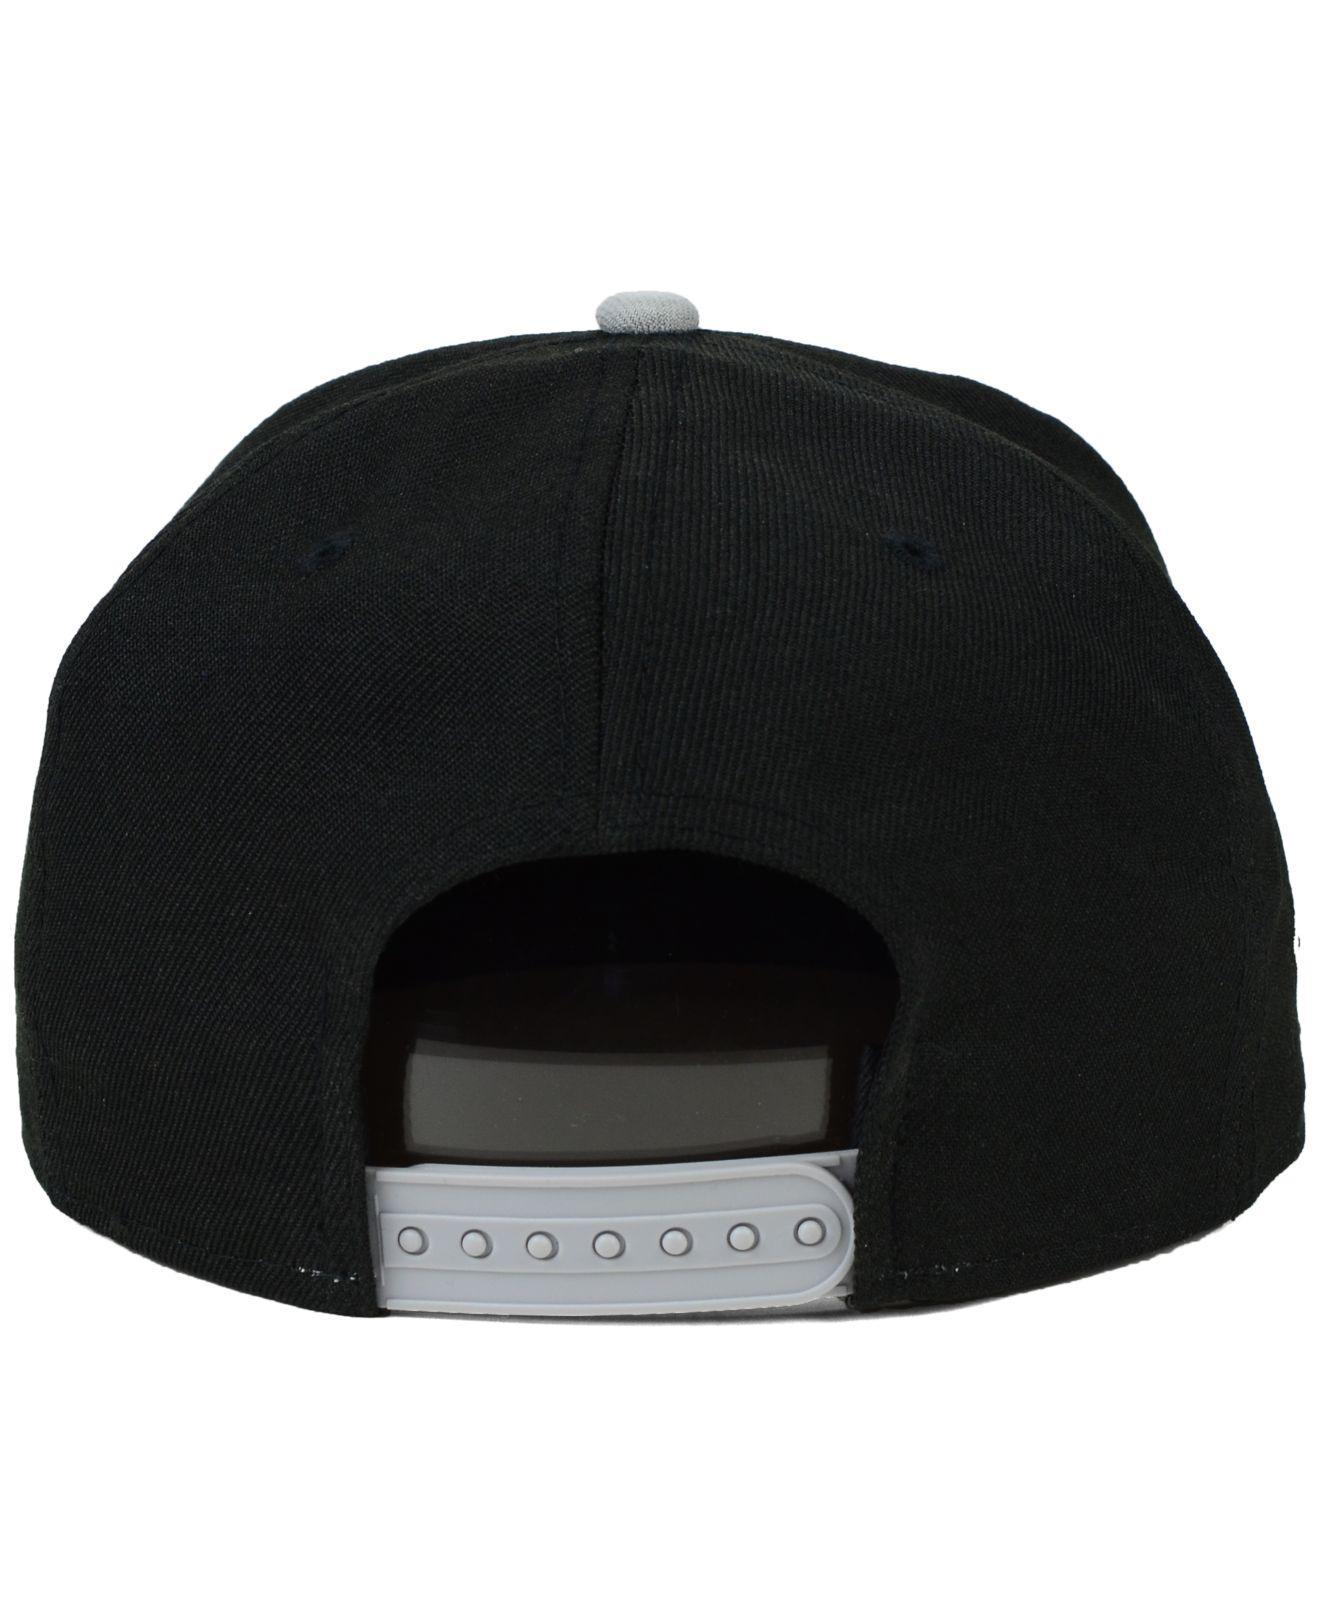 cheaper 5bde5 b4ada KTZ Chicago White Sox 2-tone Link 9fifty Snapback Cap in Black for Men -  Lyst